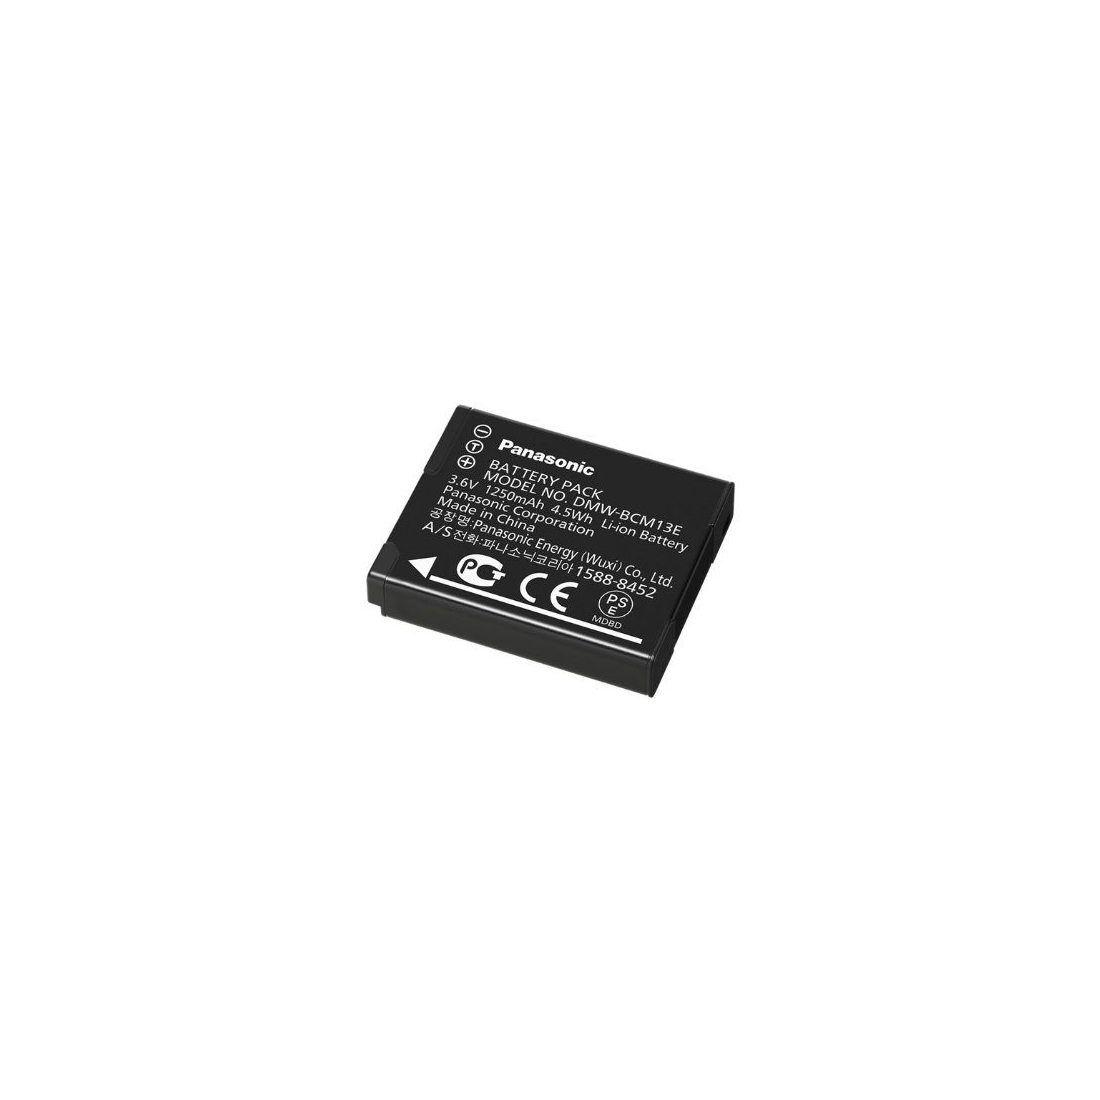 Panasonic DMW-BCM13E batterie